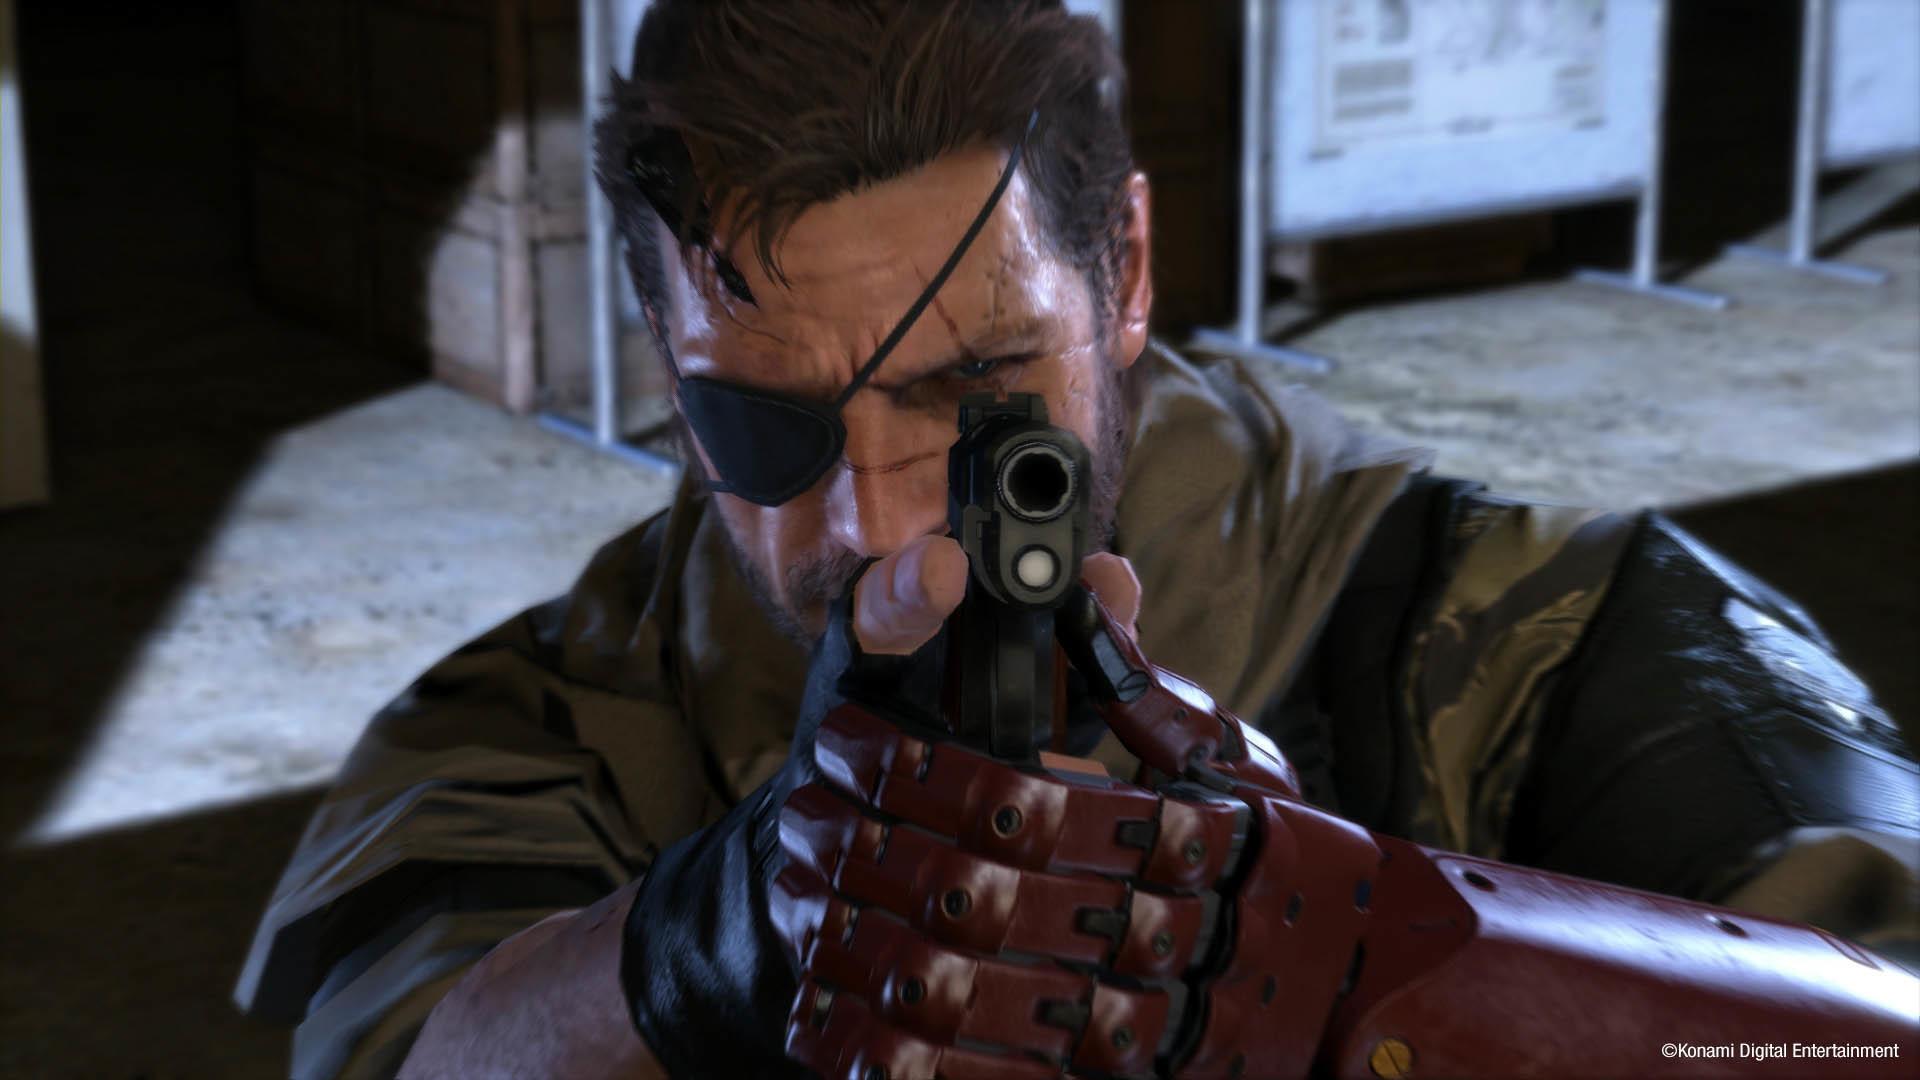 Big Boss in Action – Metal Gear Solid V: The Phantom Pain  wallpaper